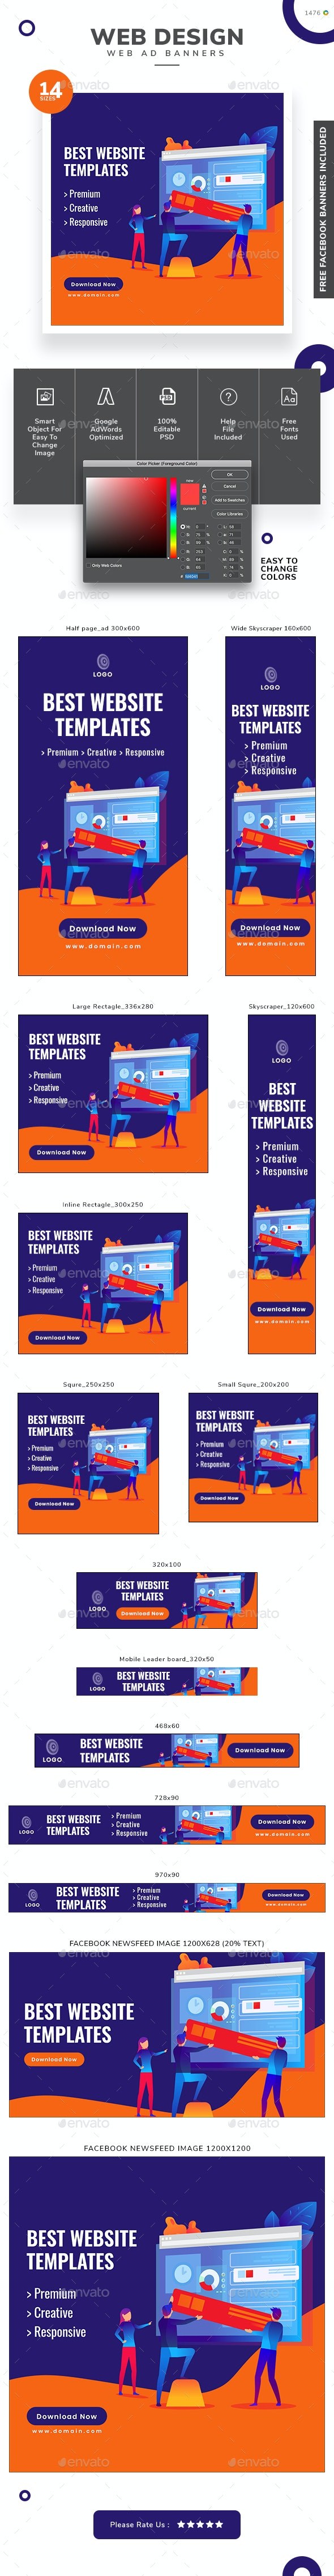 Web Design Web Banner Set - Banners & Ads Web Elements